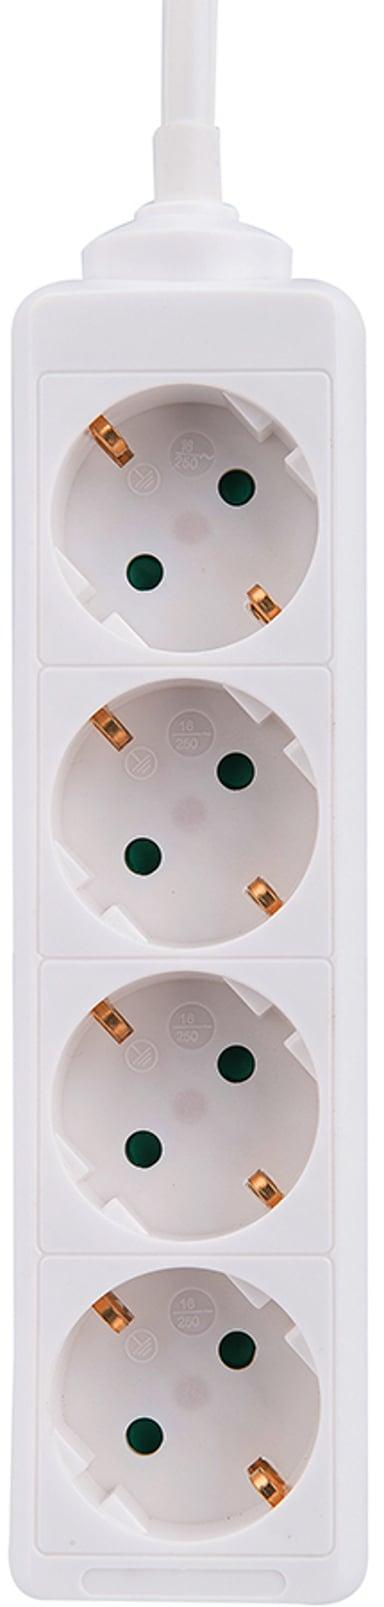 Prokord Prokord Power Socket 4Xsocket 1.5m White 4st CEE 7/4 strøm